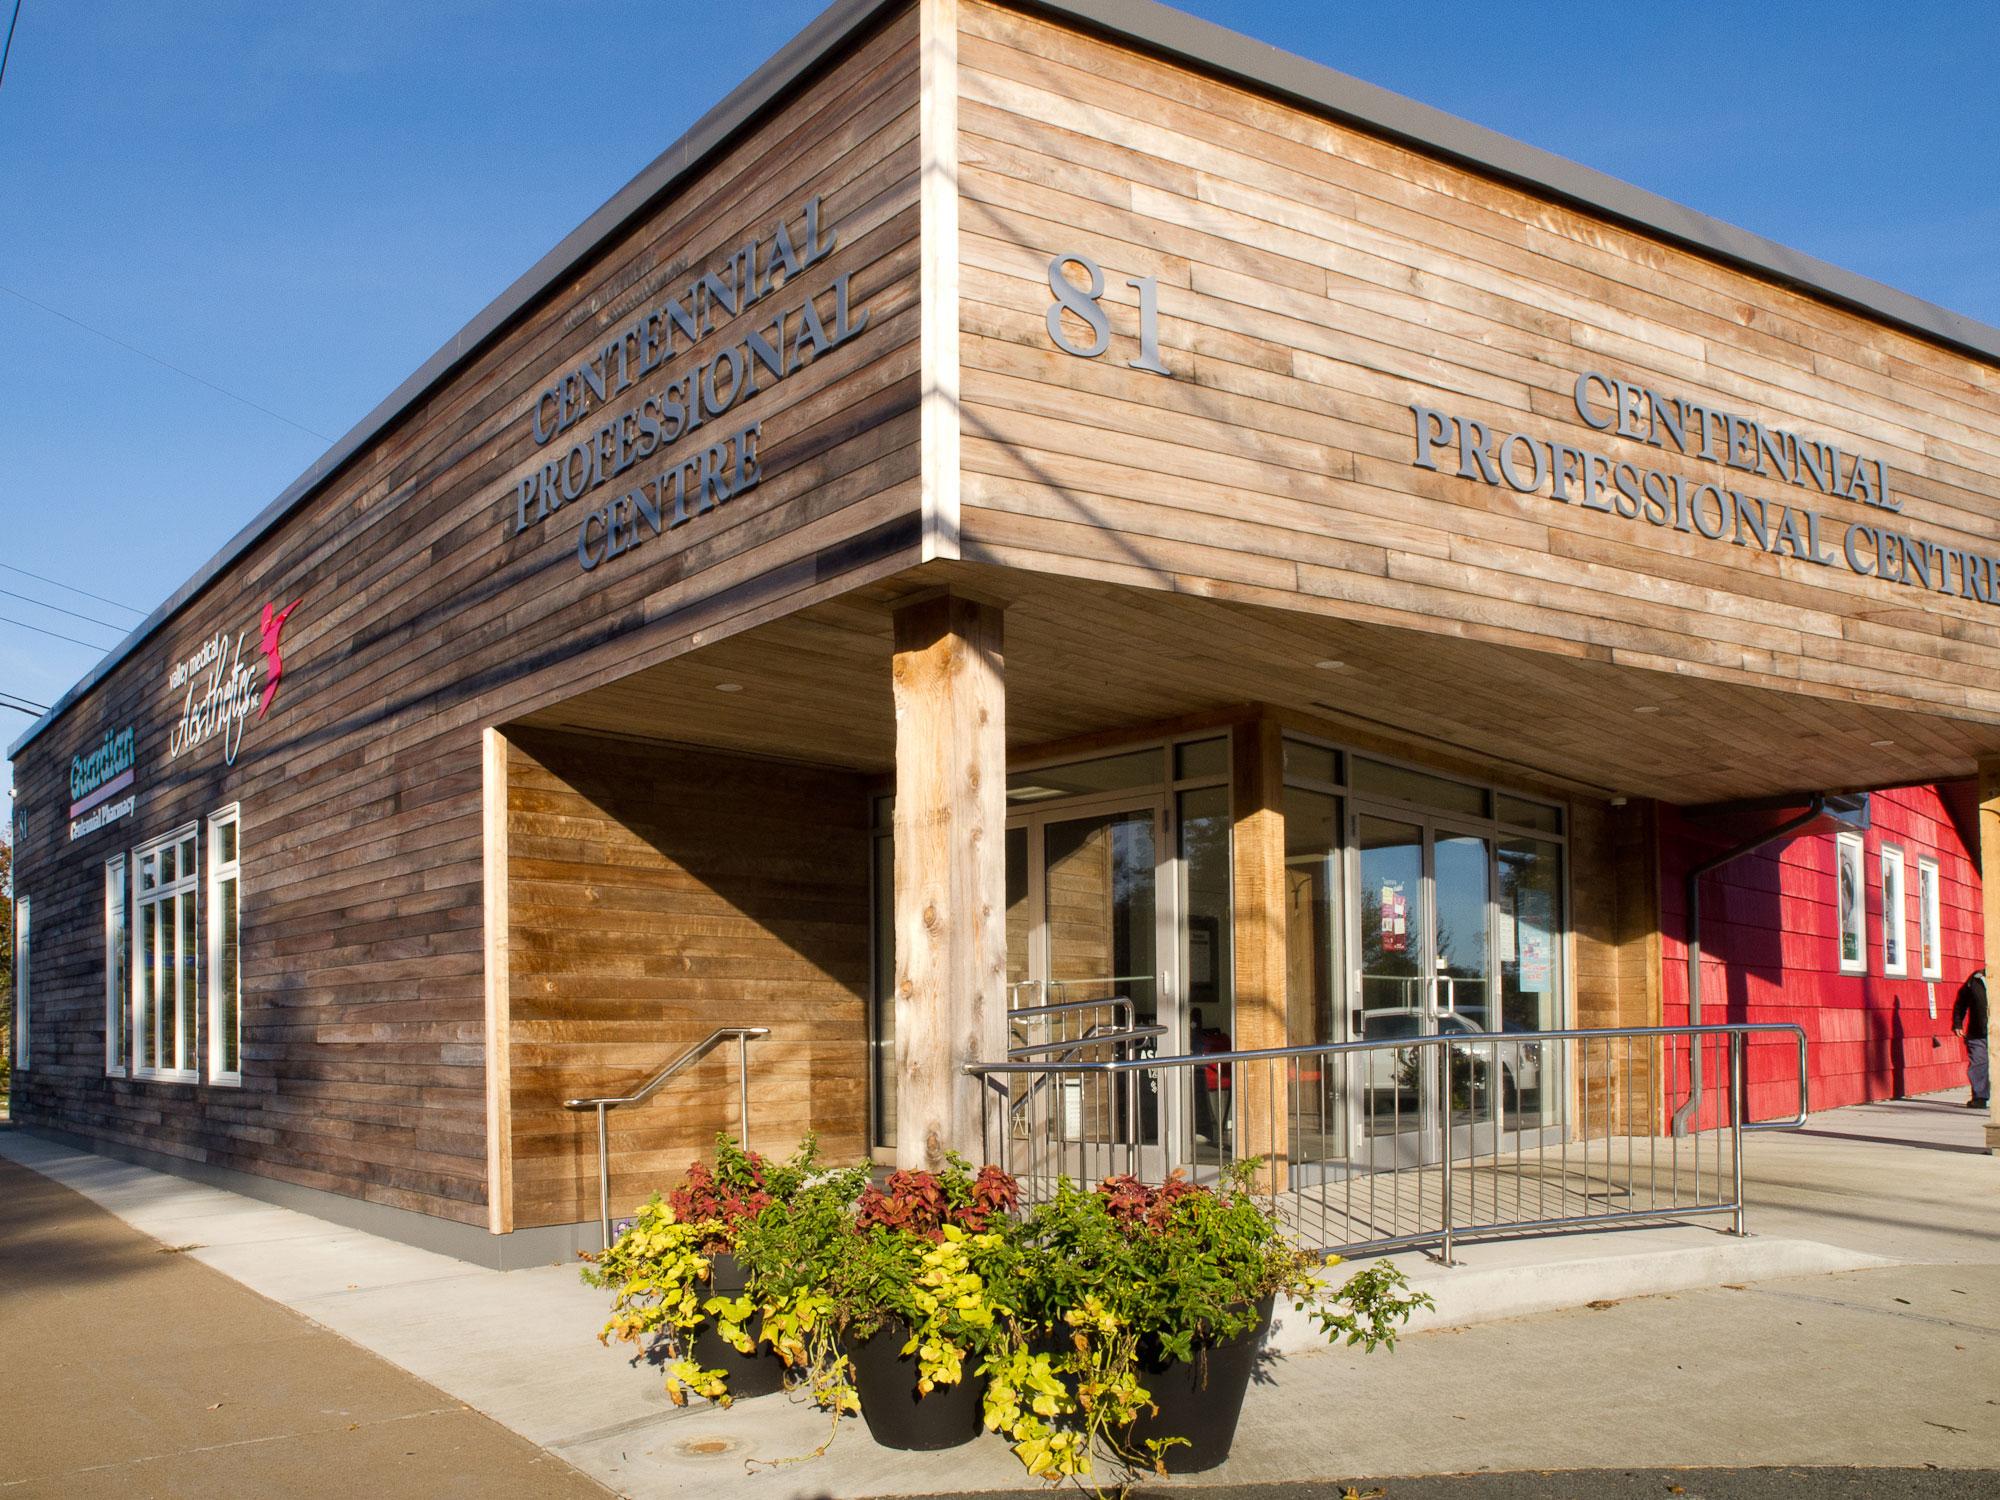 Centennial Professional Centre